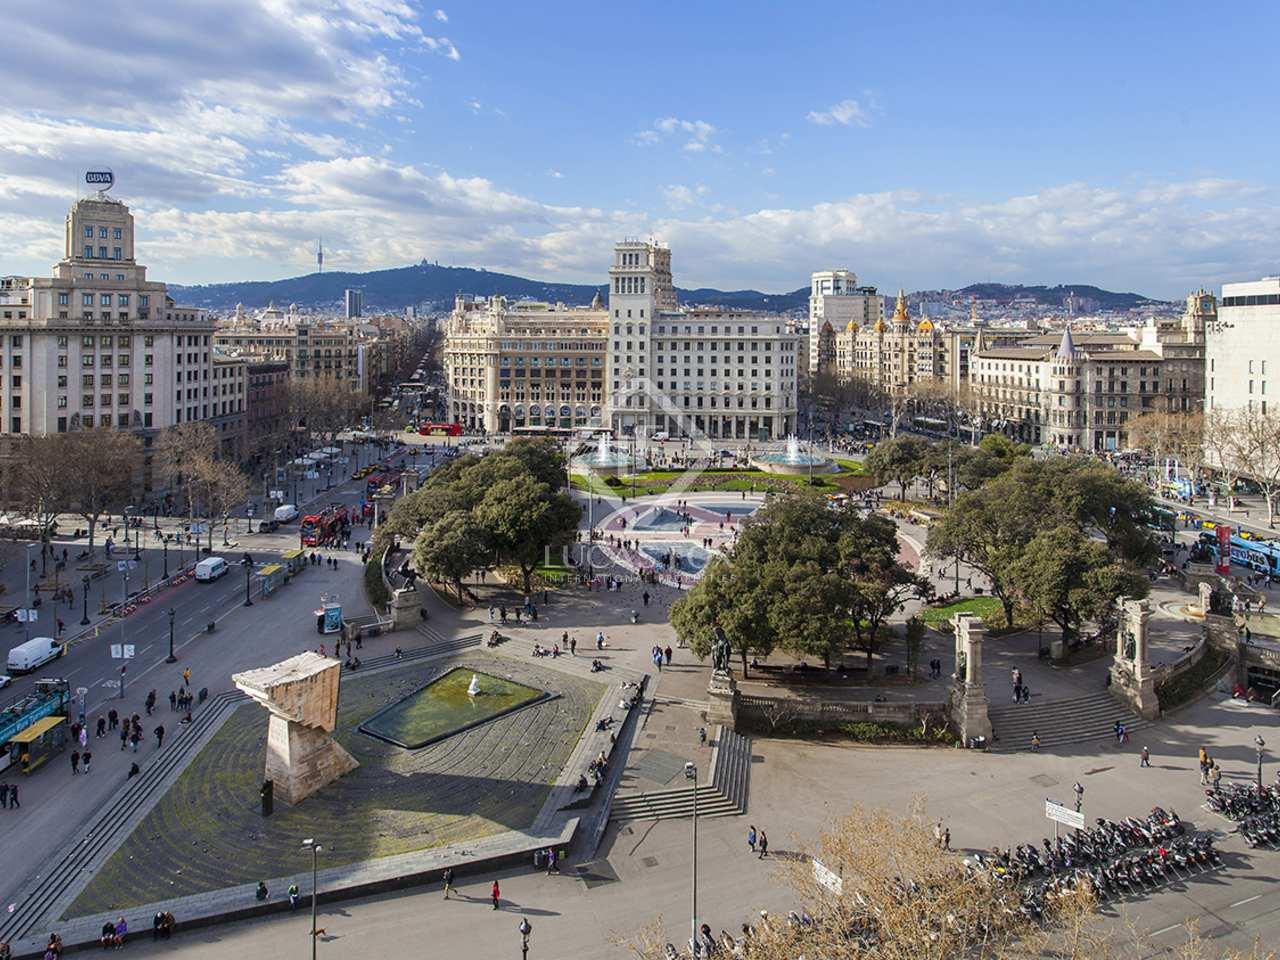 Appartement de 35m a vendre el raval barcelone - Appartement de vacances barcelone mesura ...